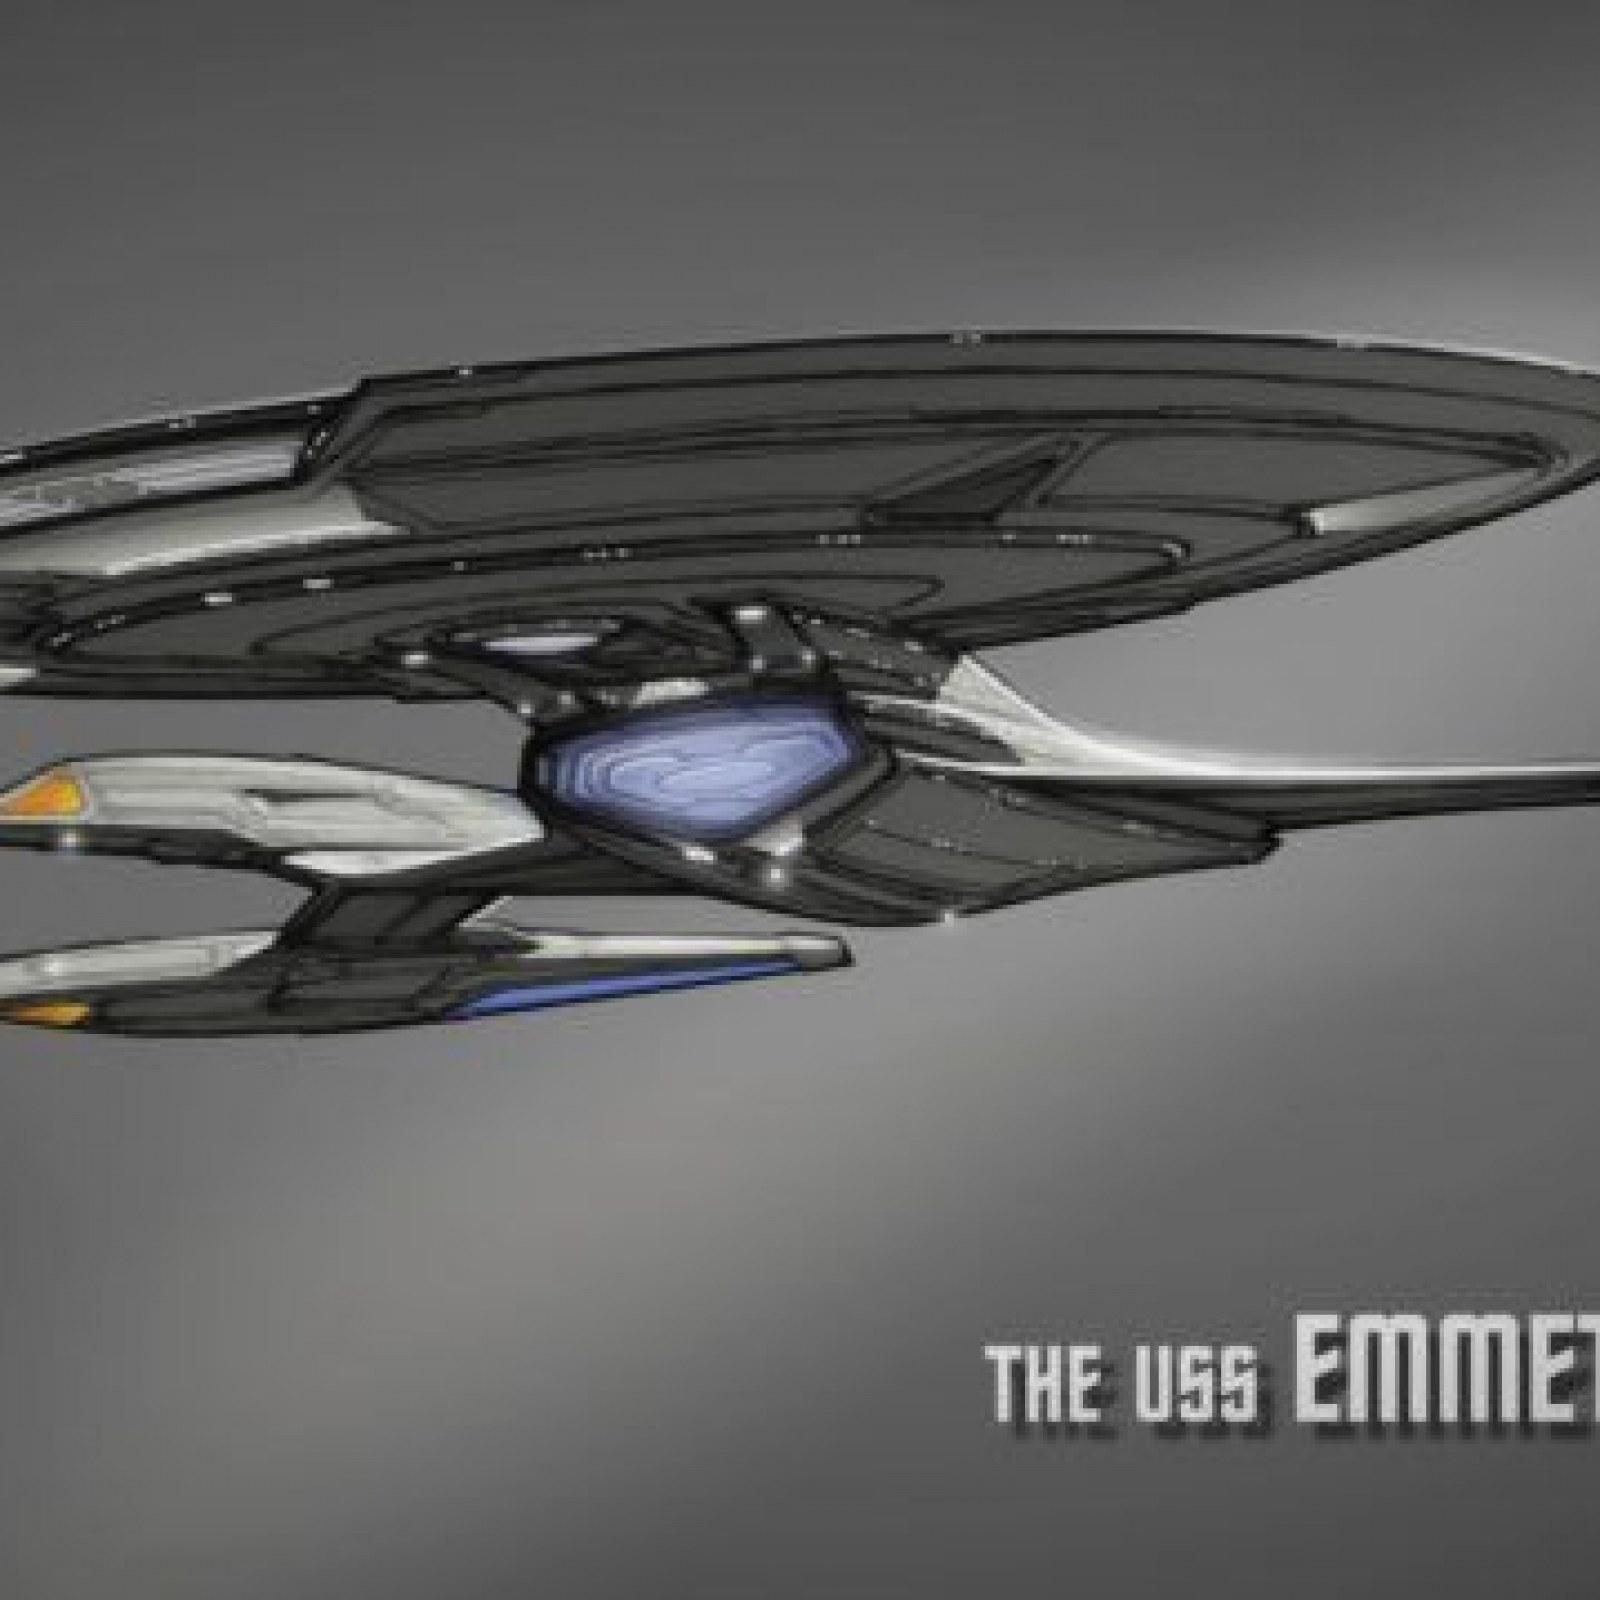 Star Trek: Deep Space Nine' Season 8 Starship Possible